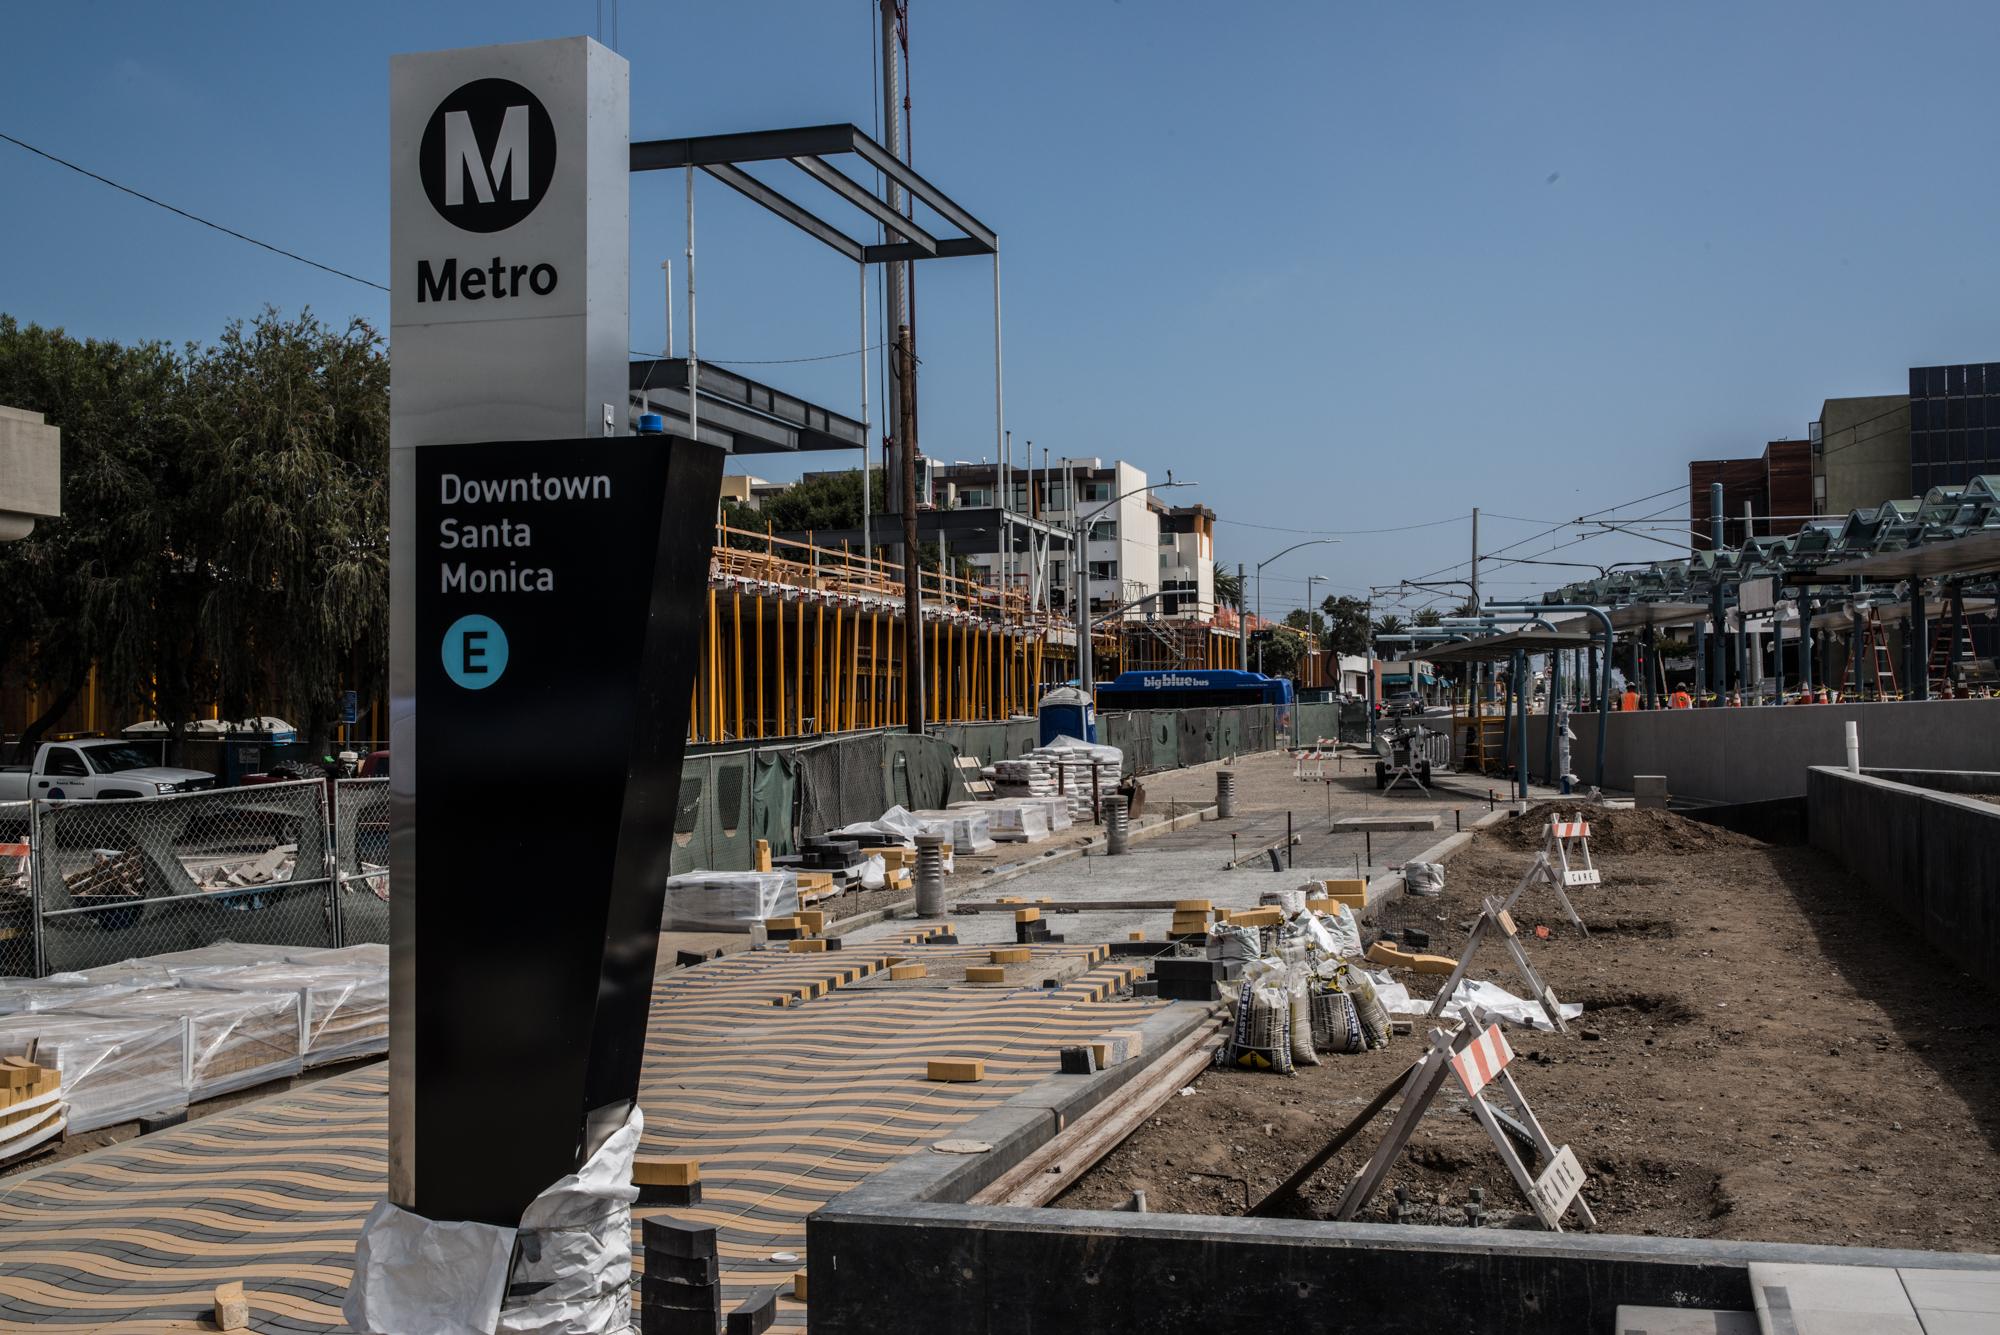 Grand-Pylon-at-Downtown-Santa-Monica-Station.jpg